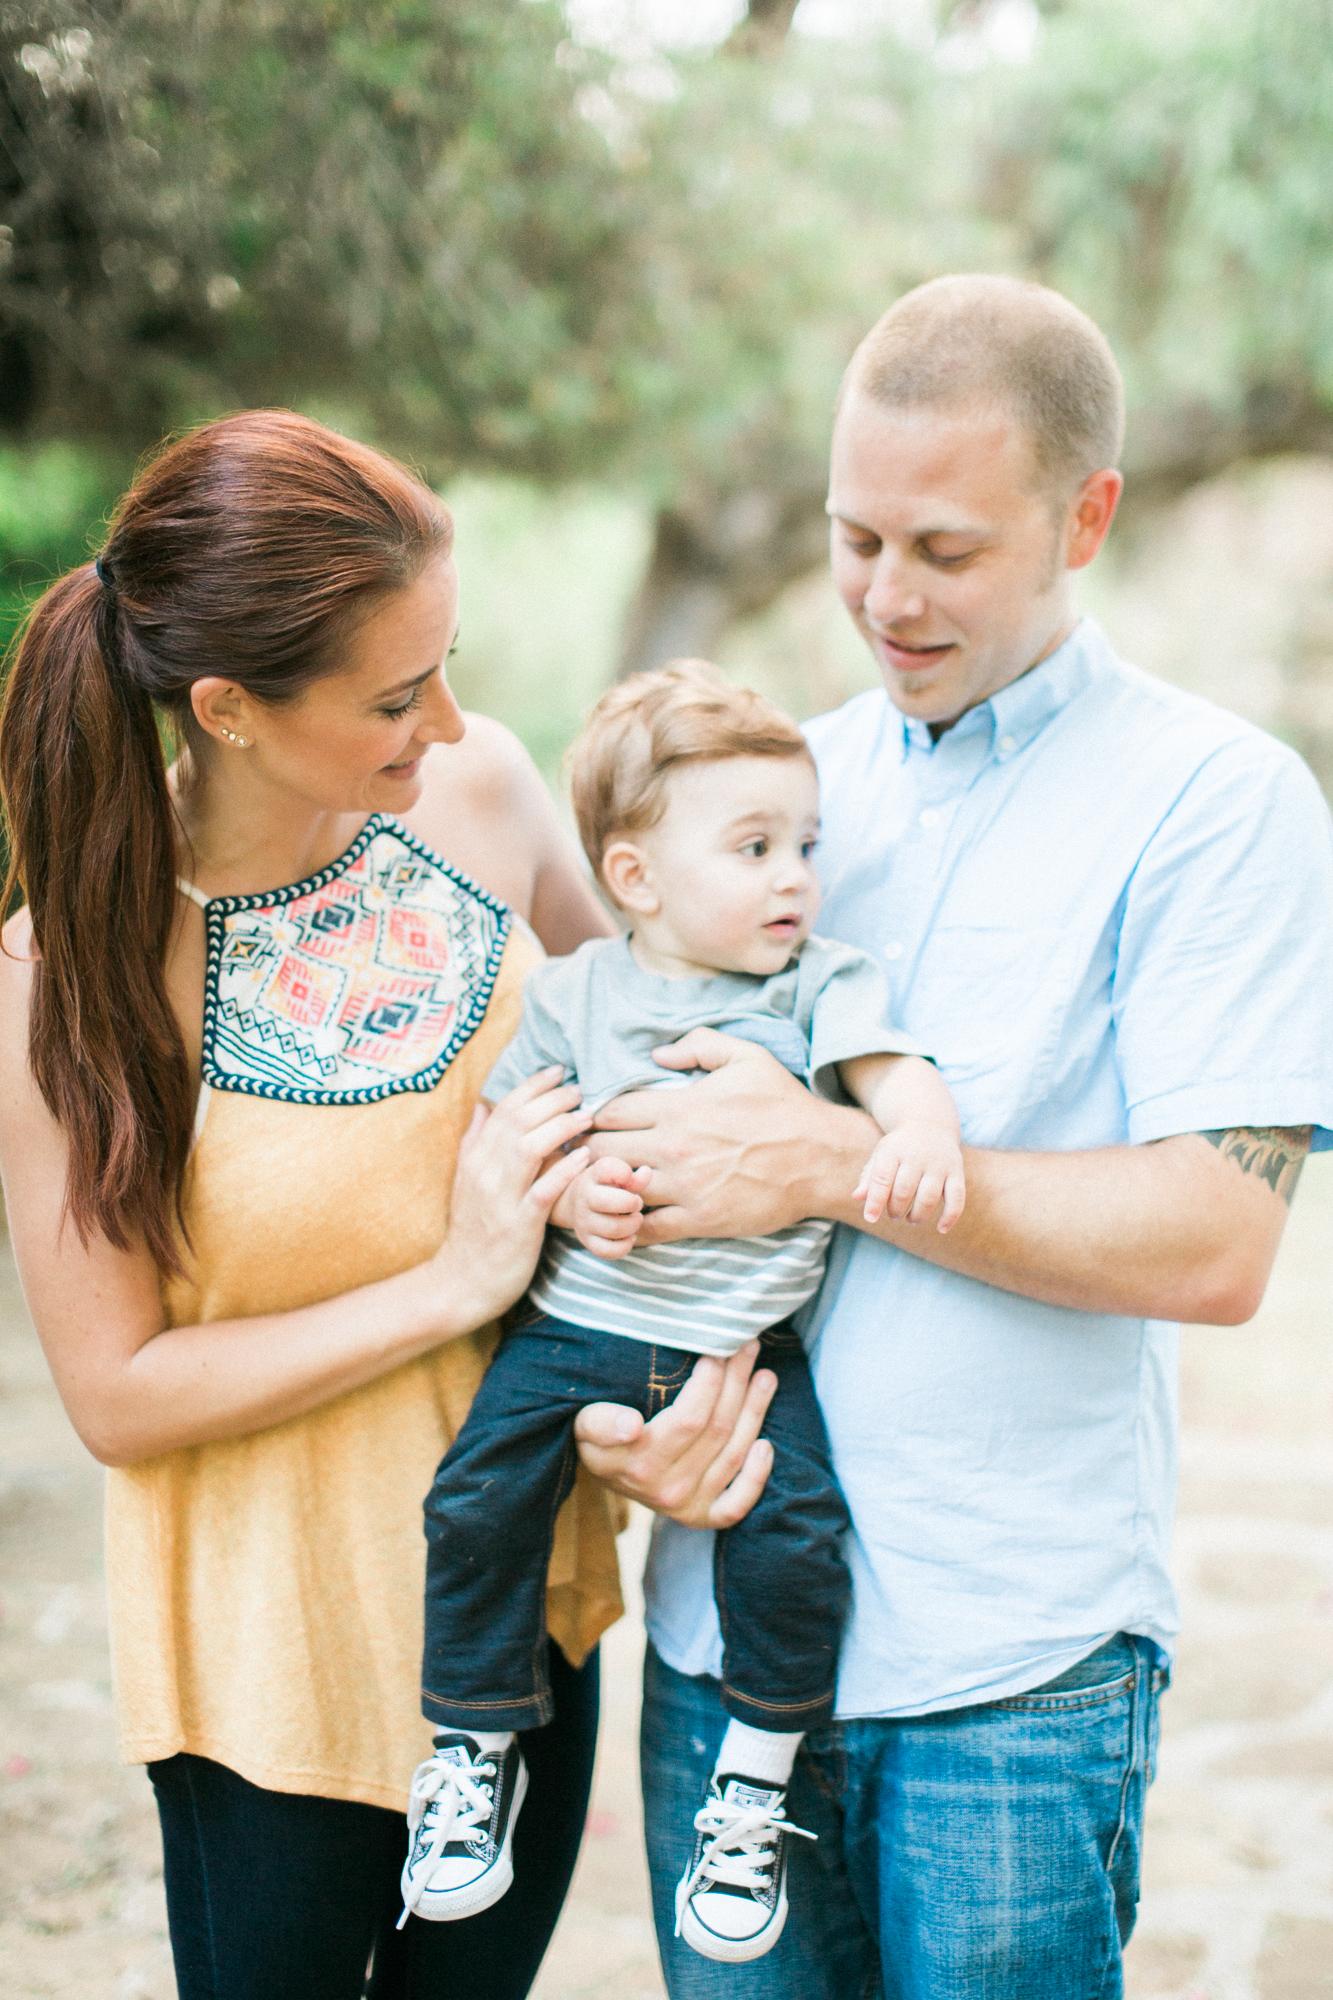 presidio-park-family-photos-21.jpg